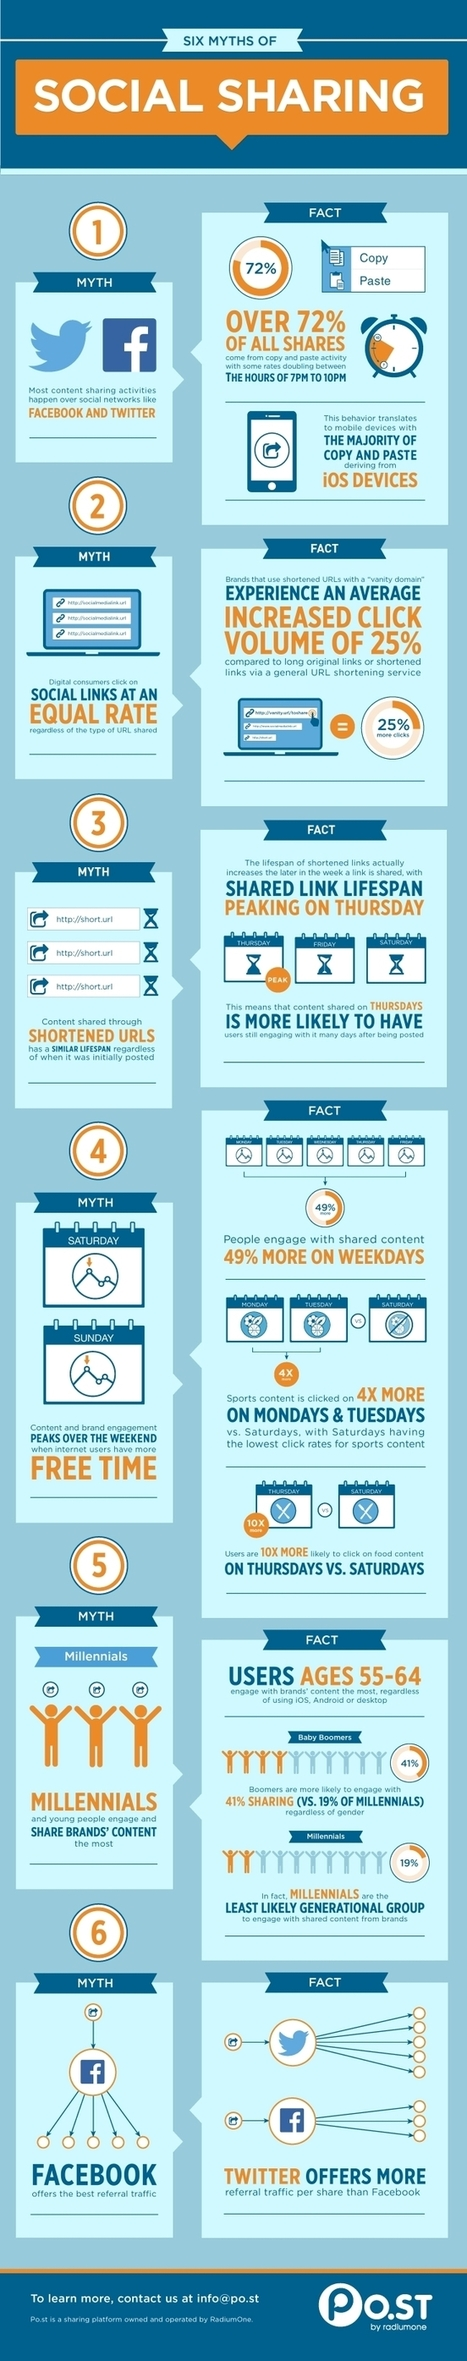 Infographic: Six myths of social sharing   Inspiring Social Media   Scoop.it